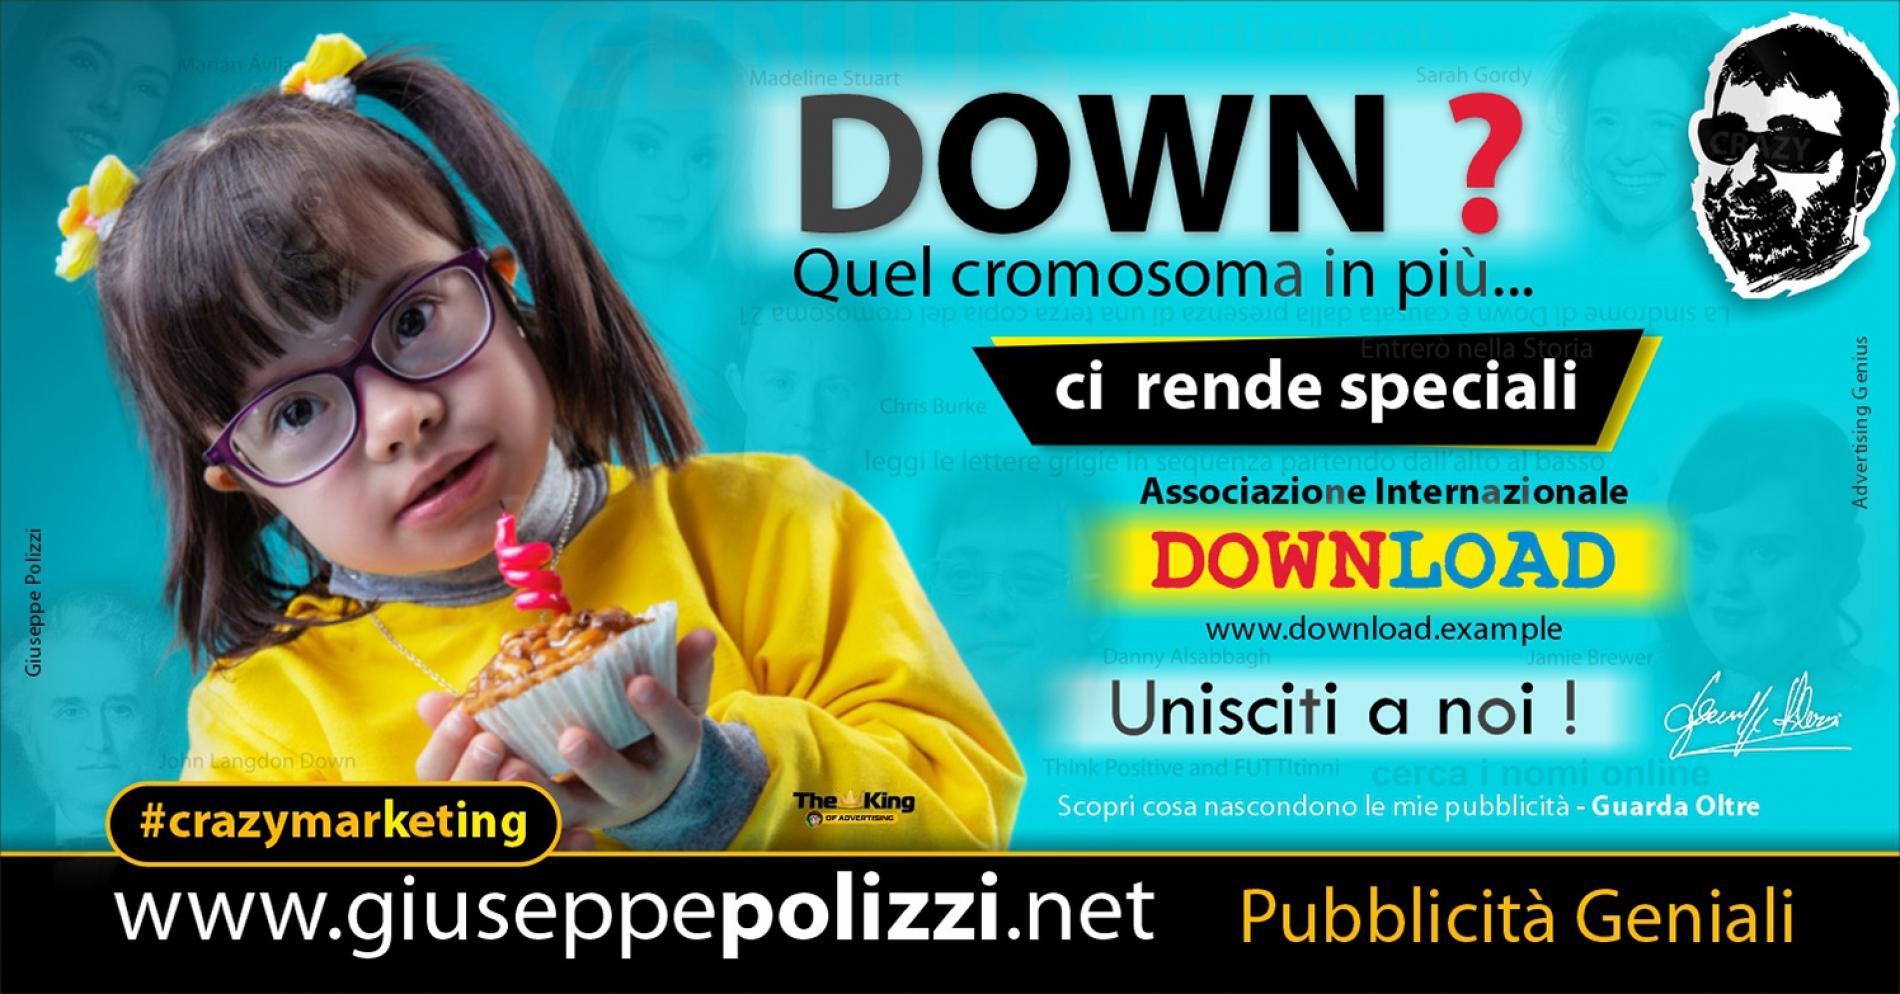 Giuseppe Polizzi crazymarketing DOWN pubblicità geniali